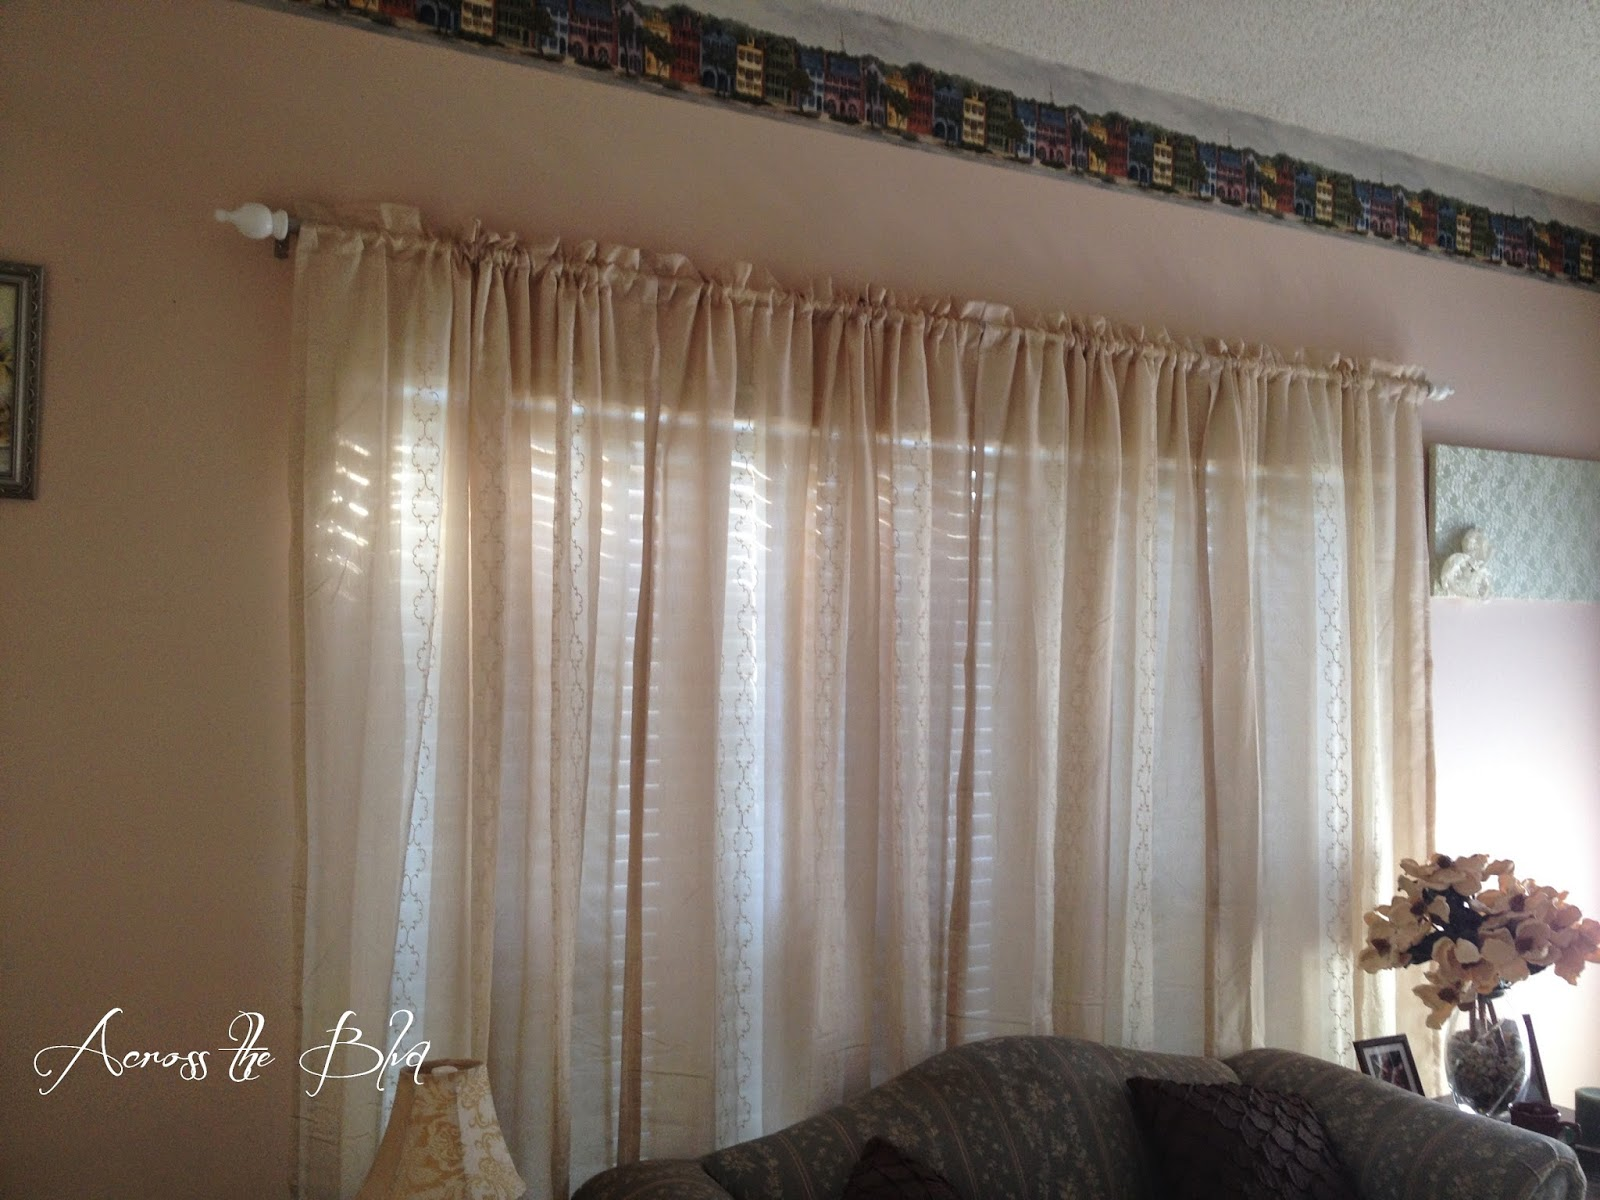 Across the Boulevard DIY Curtain Rods for Large Windows